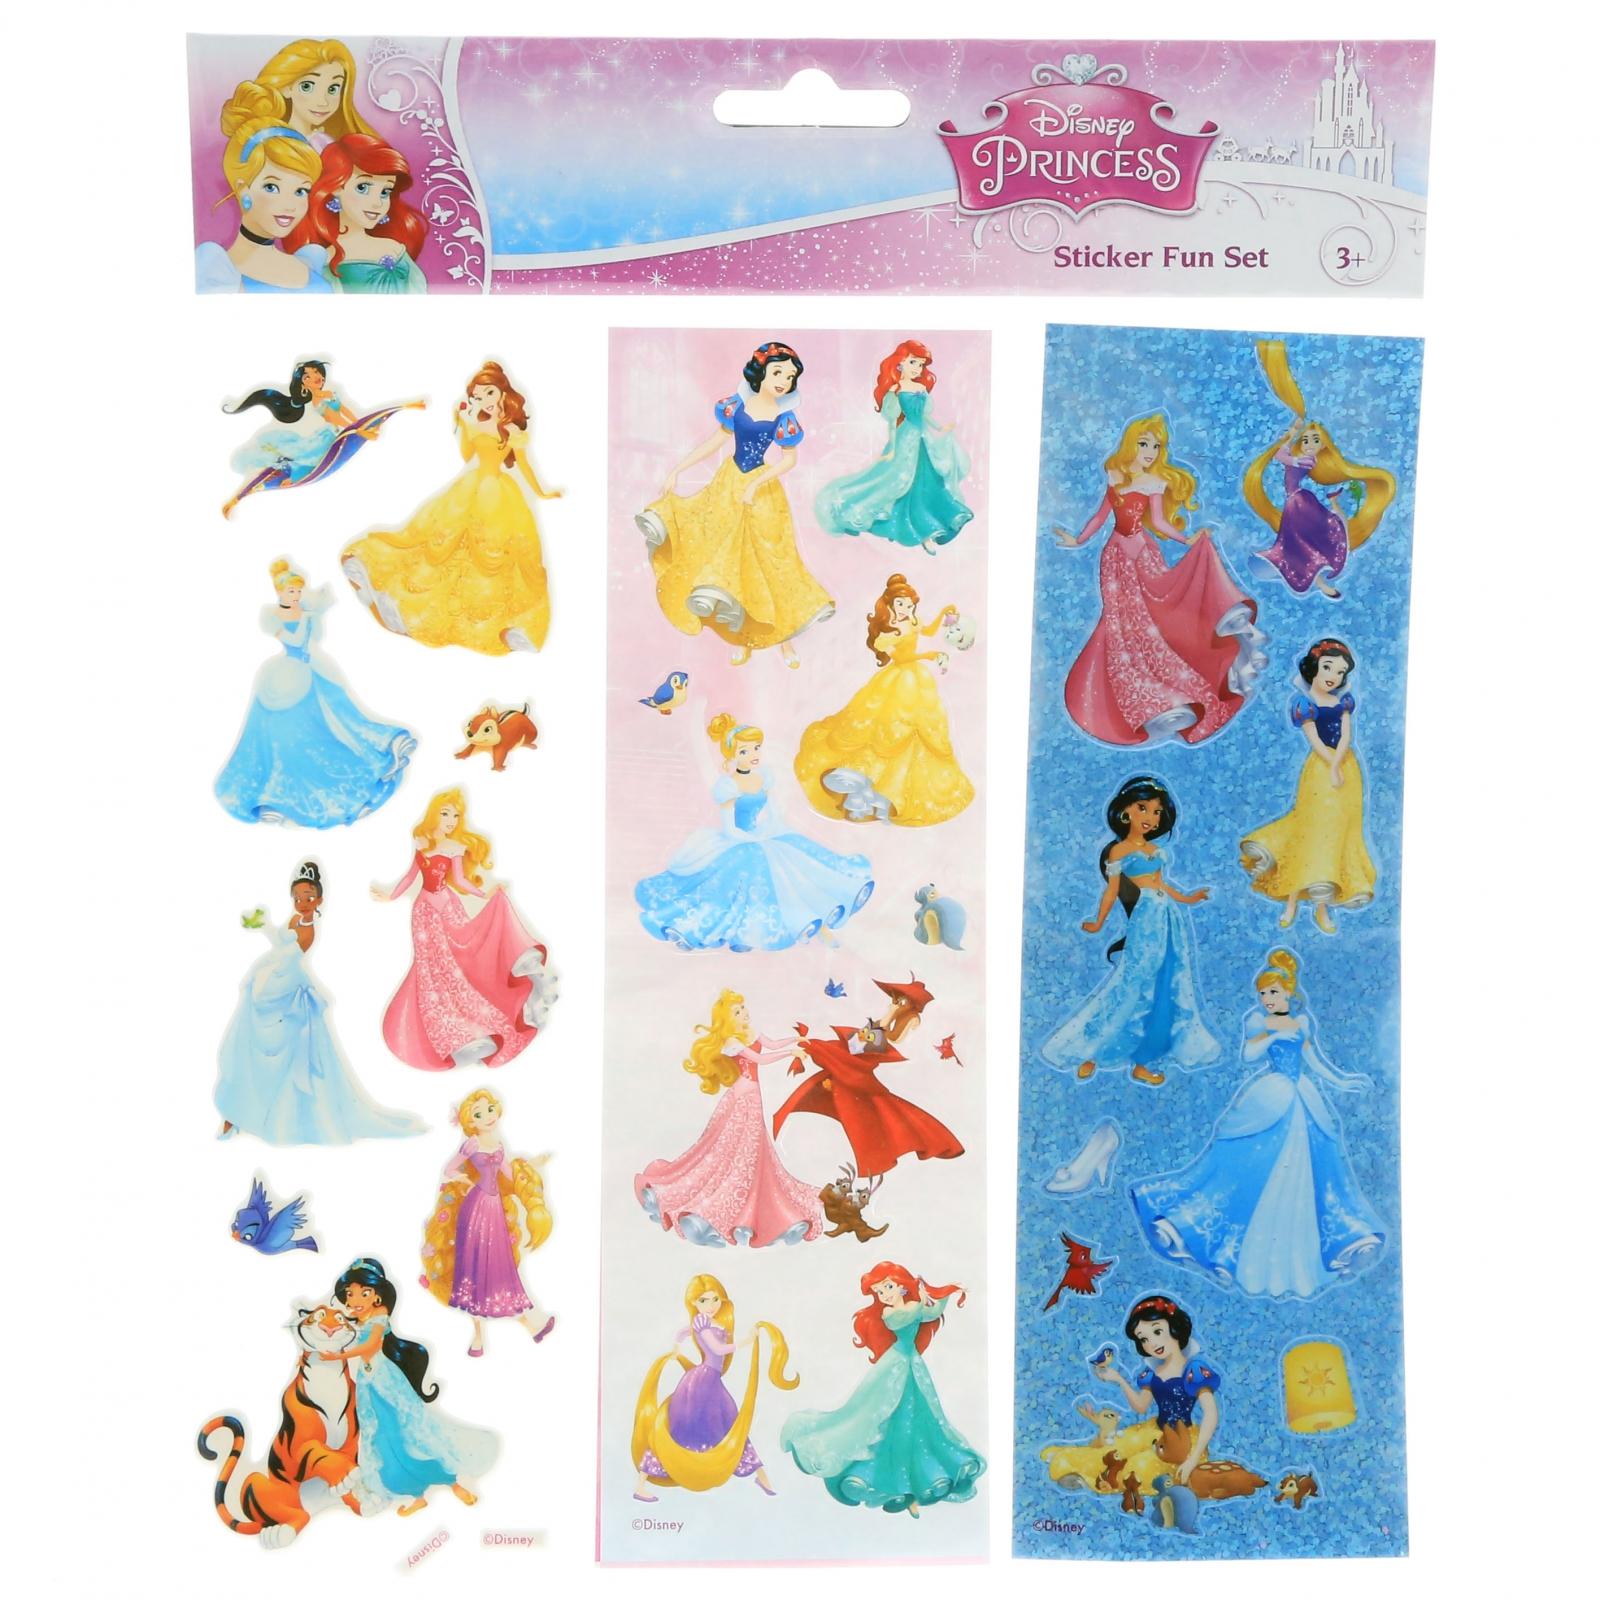 Disney Princess Girls Crafting Stickers Kids Art Supplies Stocking Stuffer Set